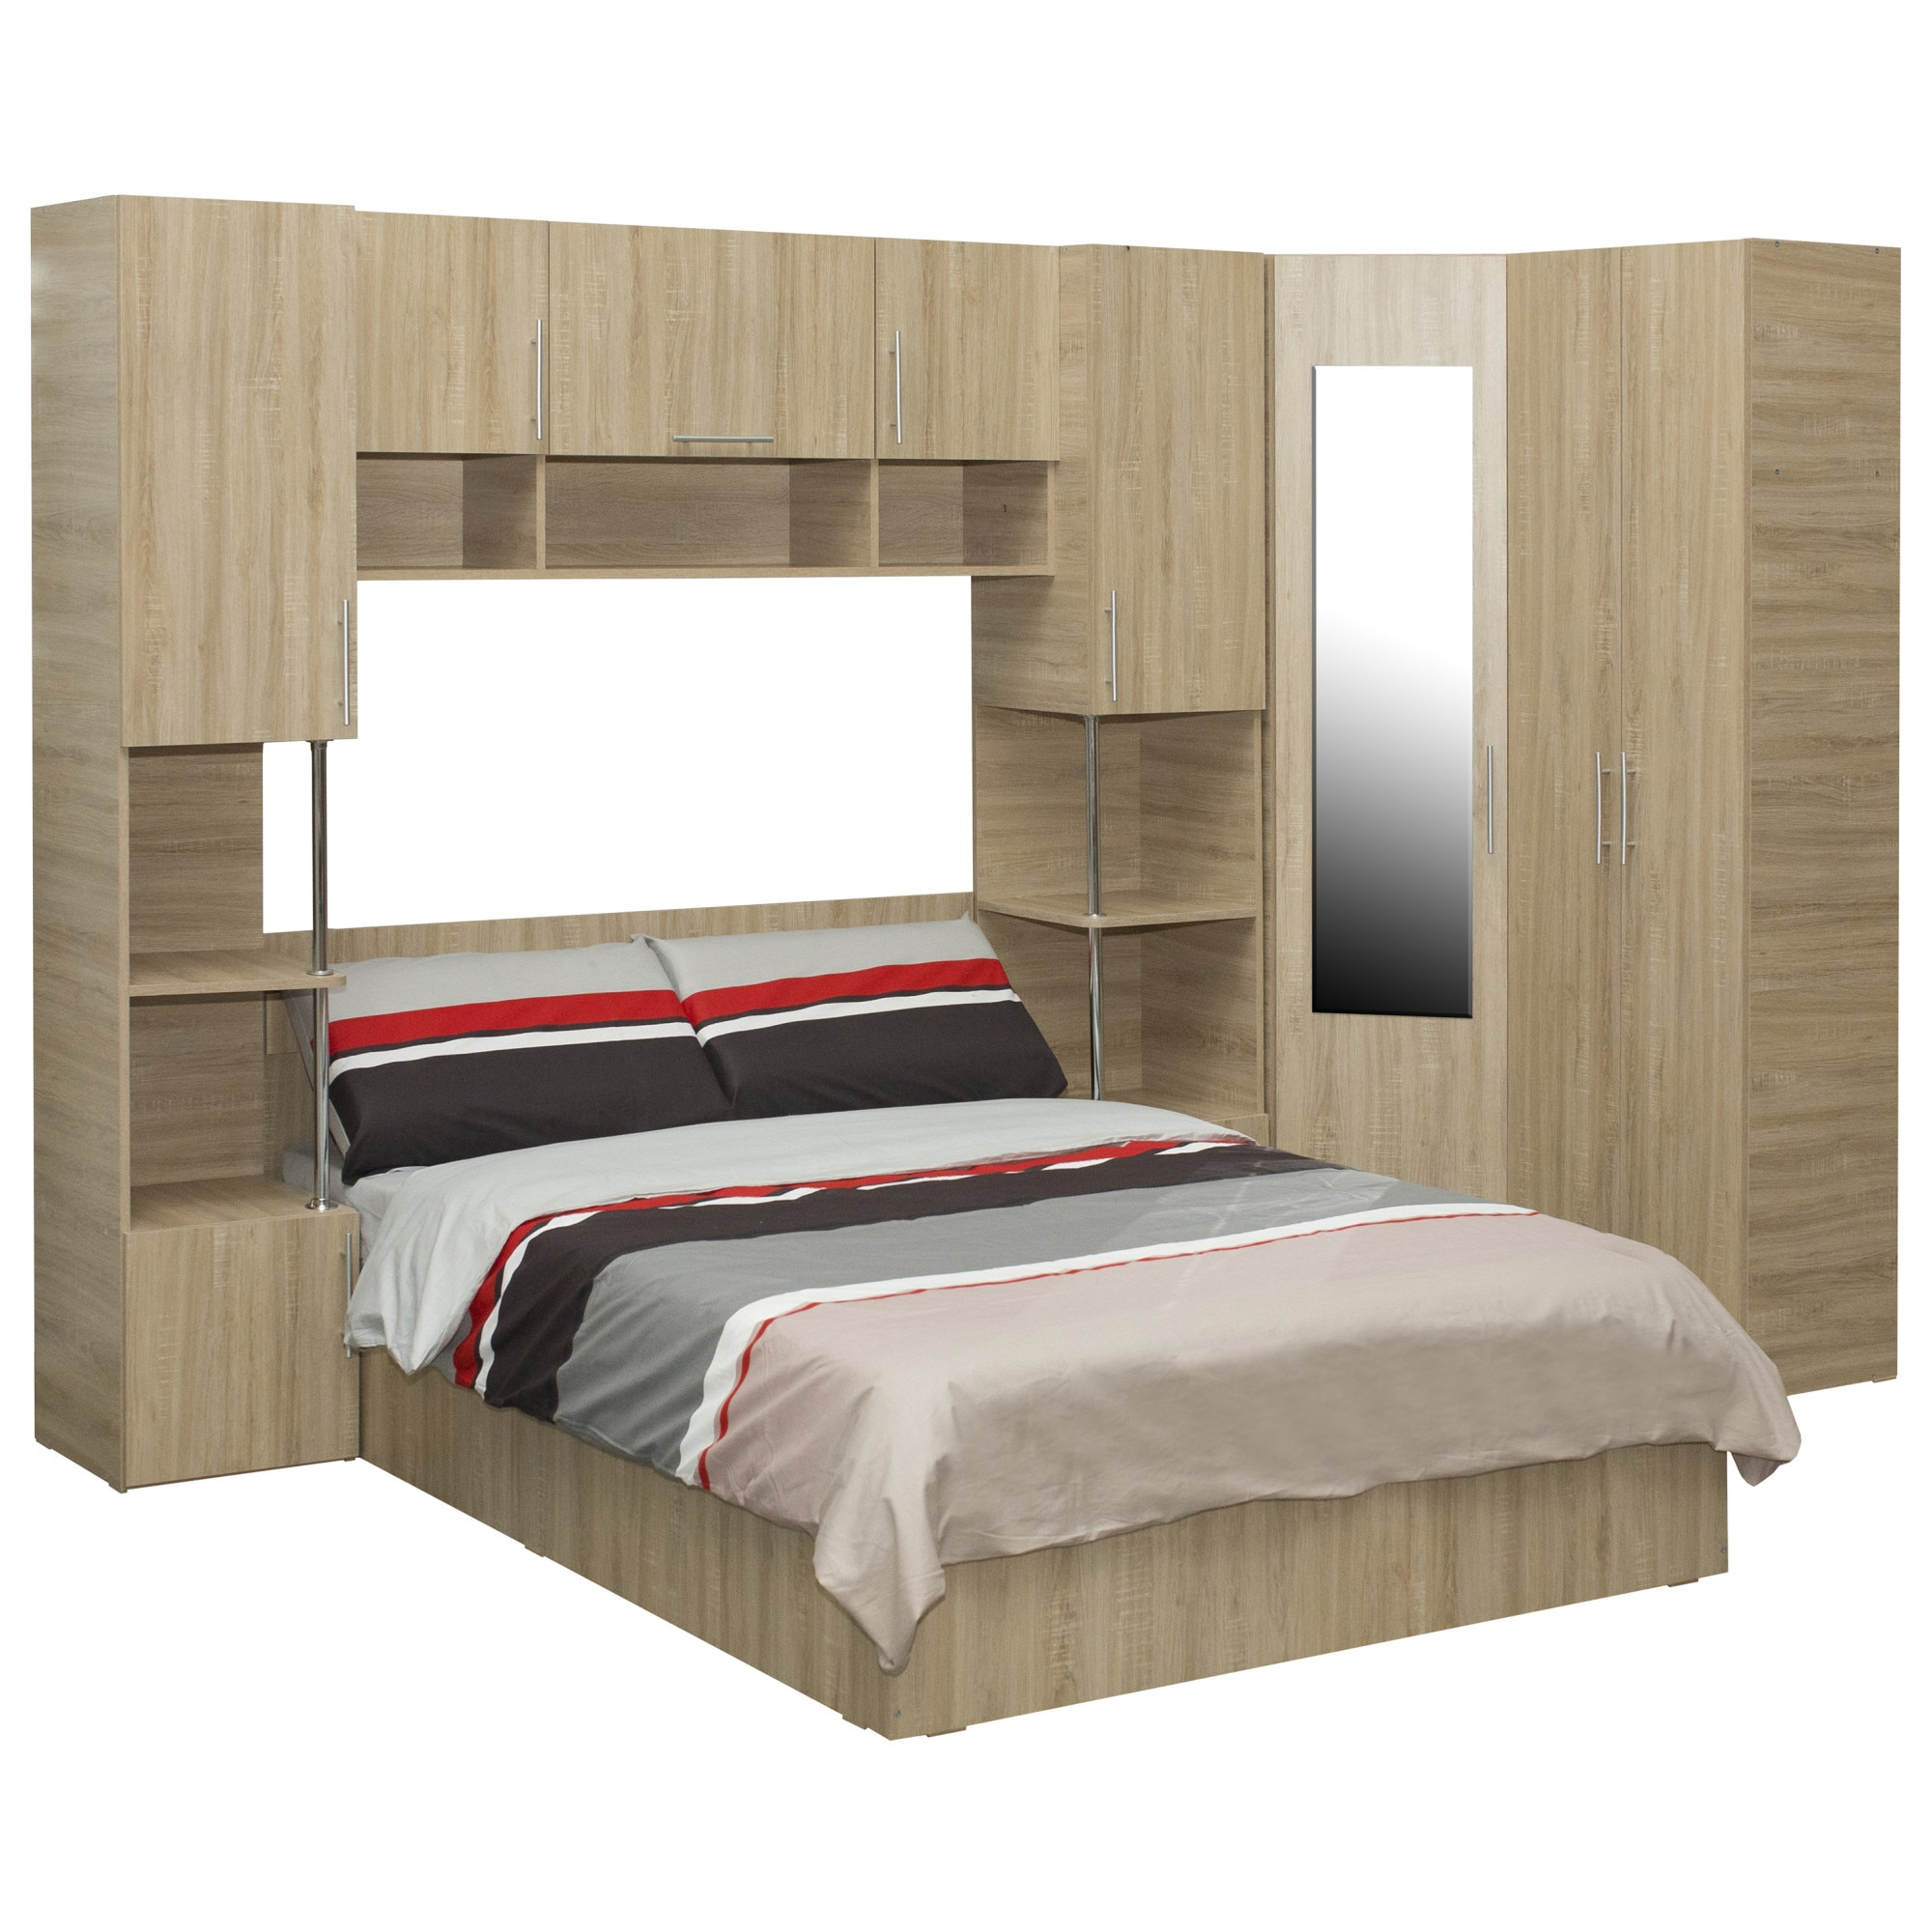 Fotografie Dormitor complet Kring Yasmine, 295x200x200 cm, Sonoma